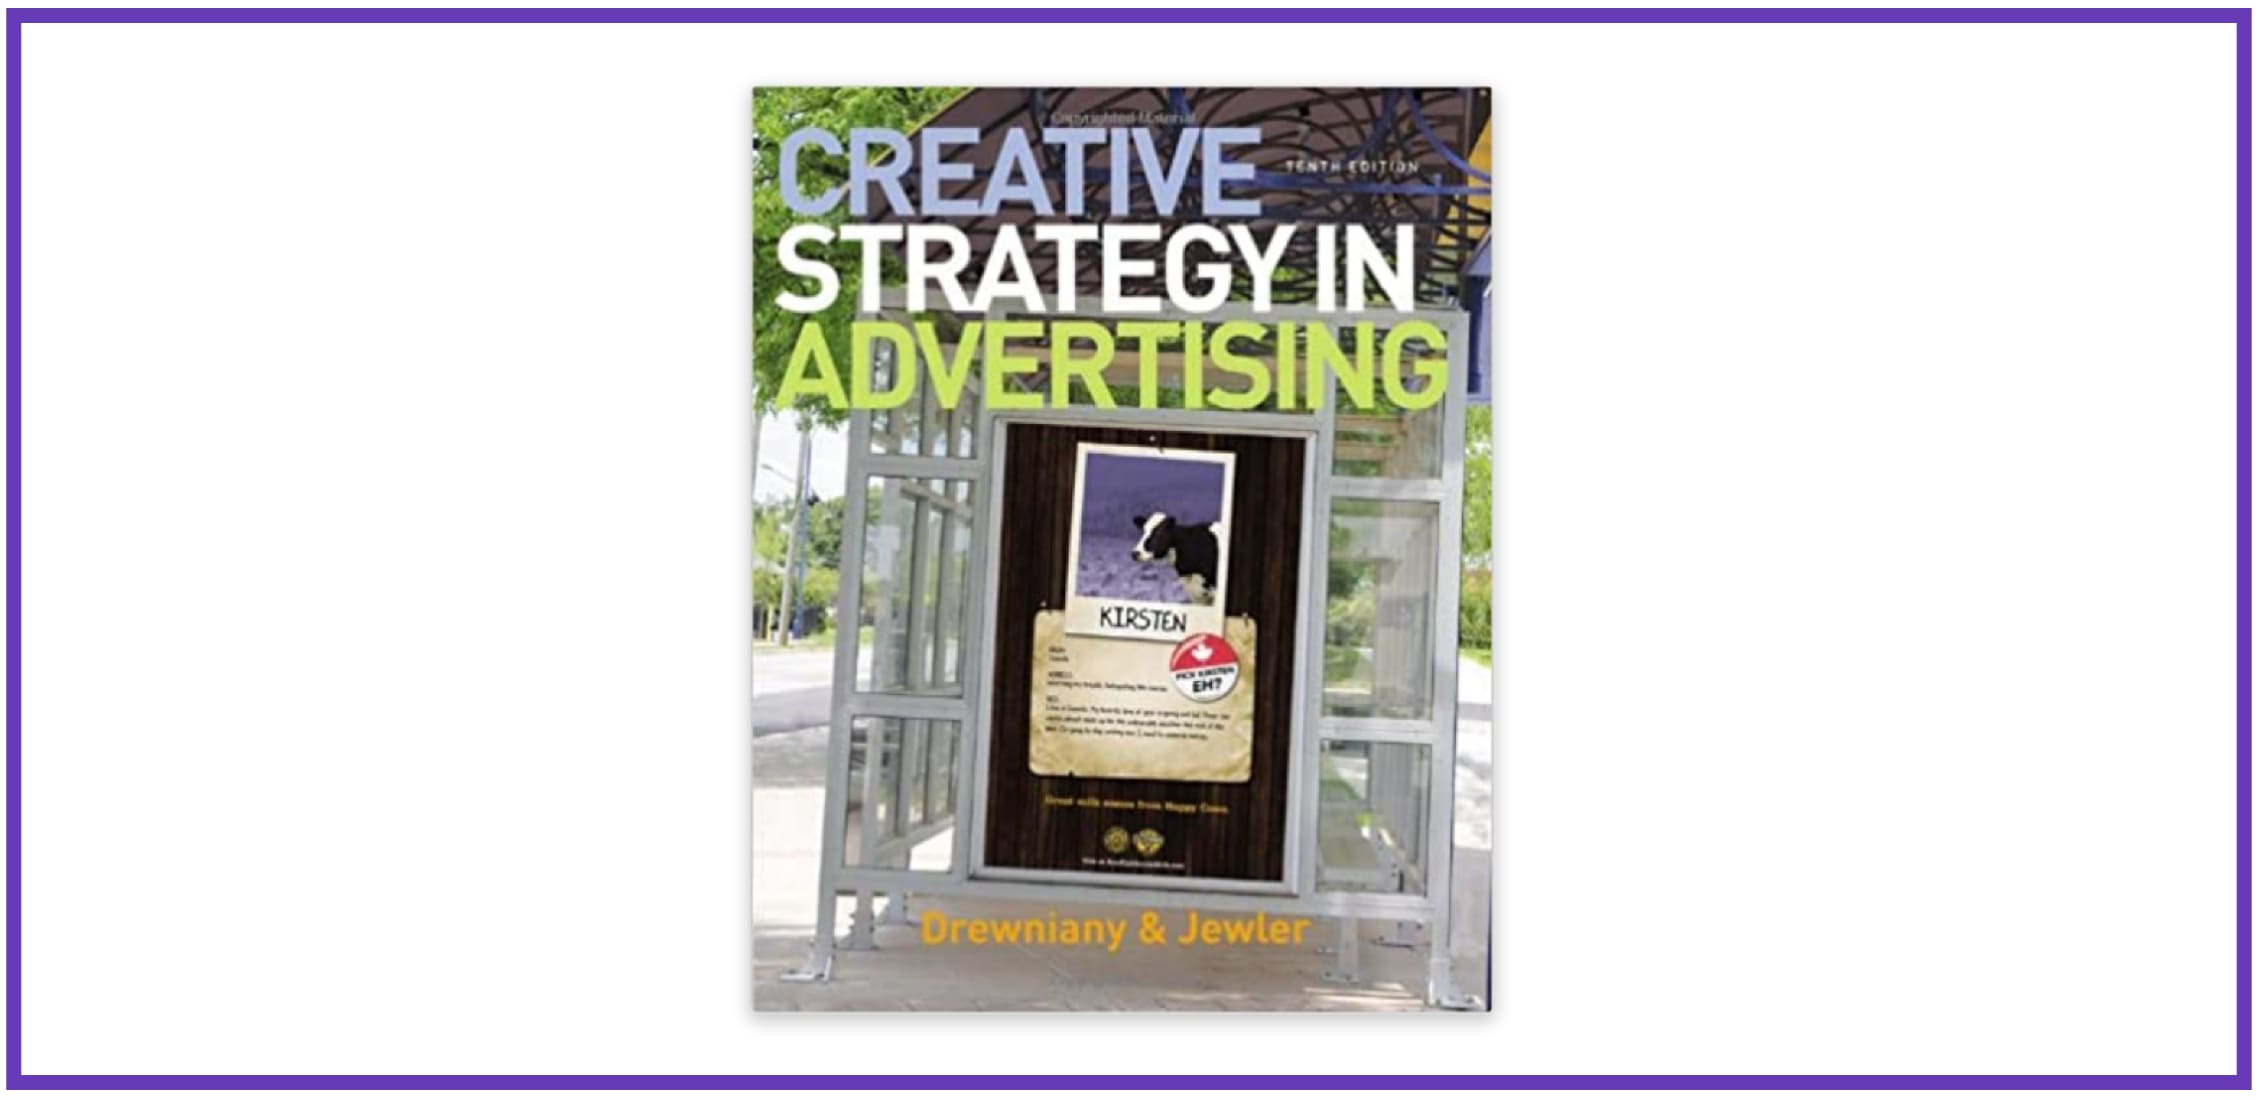 «Creative Strategy in Advertising» by Bonnie L. Drewniany, A. Jerome Jewler